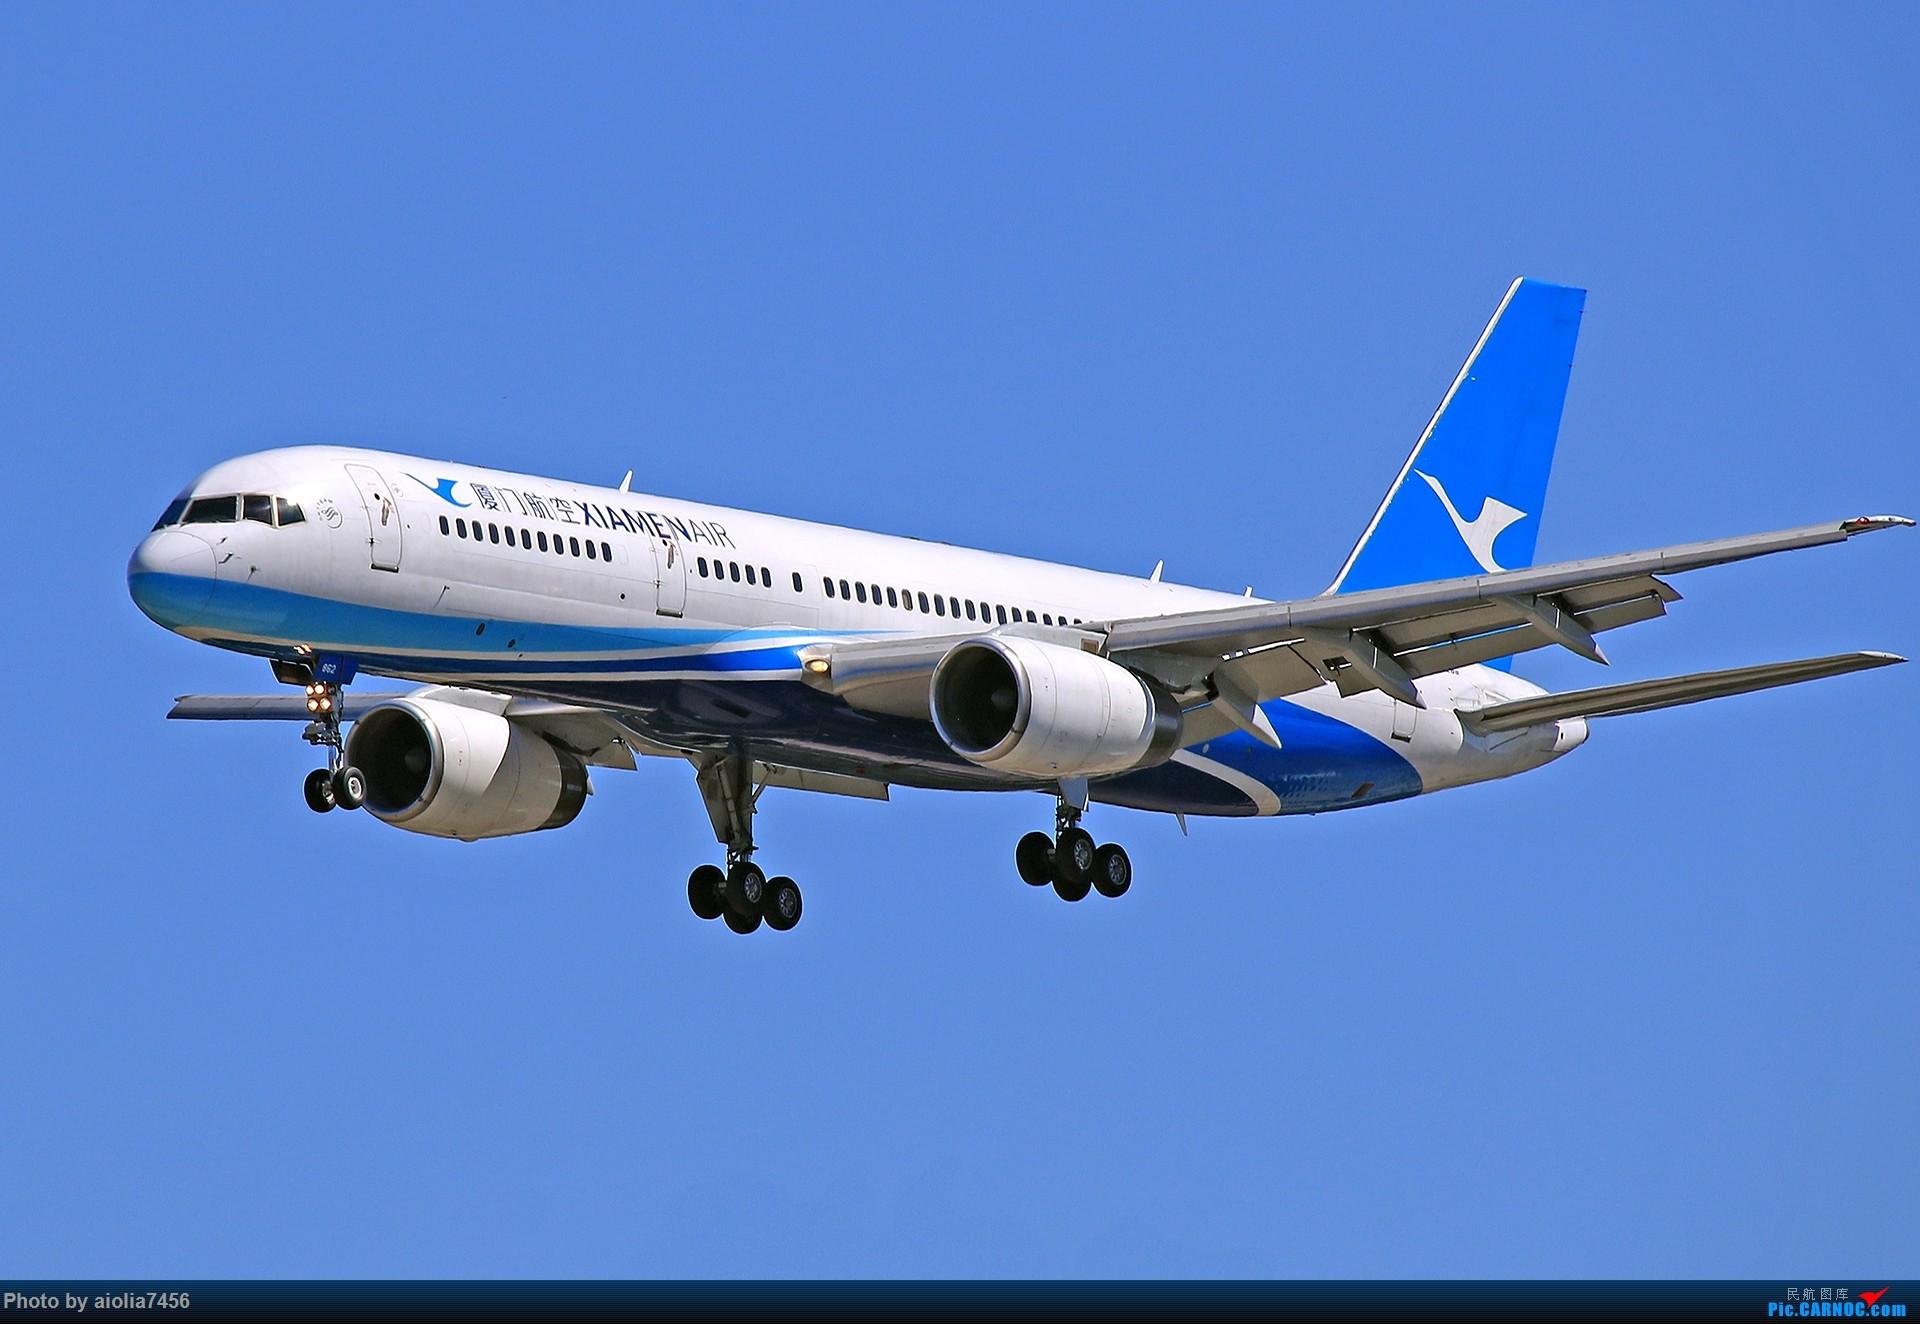 Re:[原创]合肥飞友会[霸都飞友会]冷风过境,吹回了久违的蓝天,而我刚刚好路过PEK BOEING 757-200 B-2862 中国北京首都国际机场